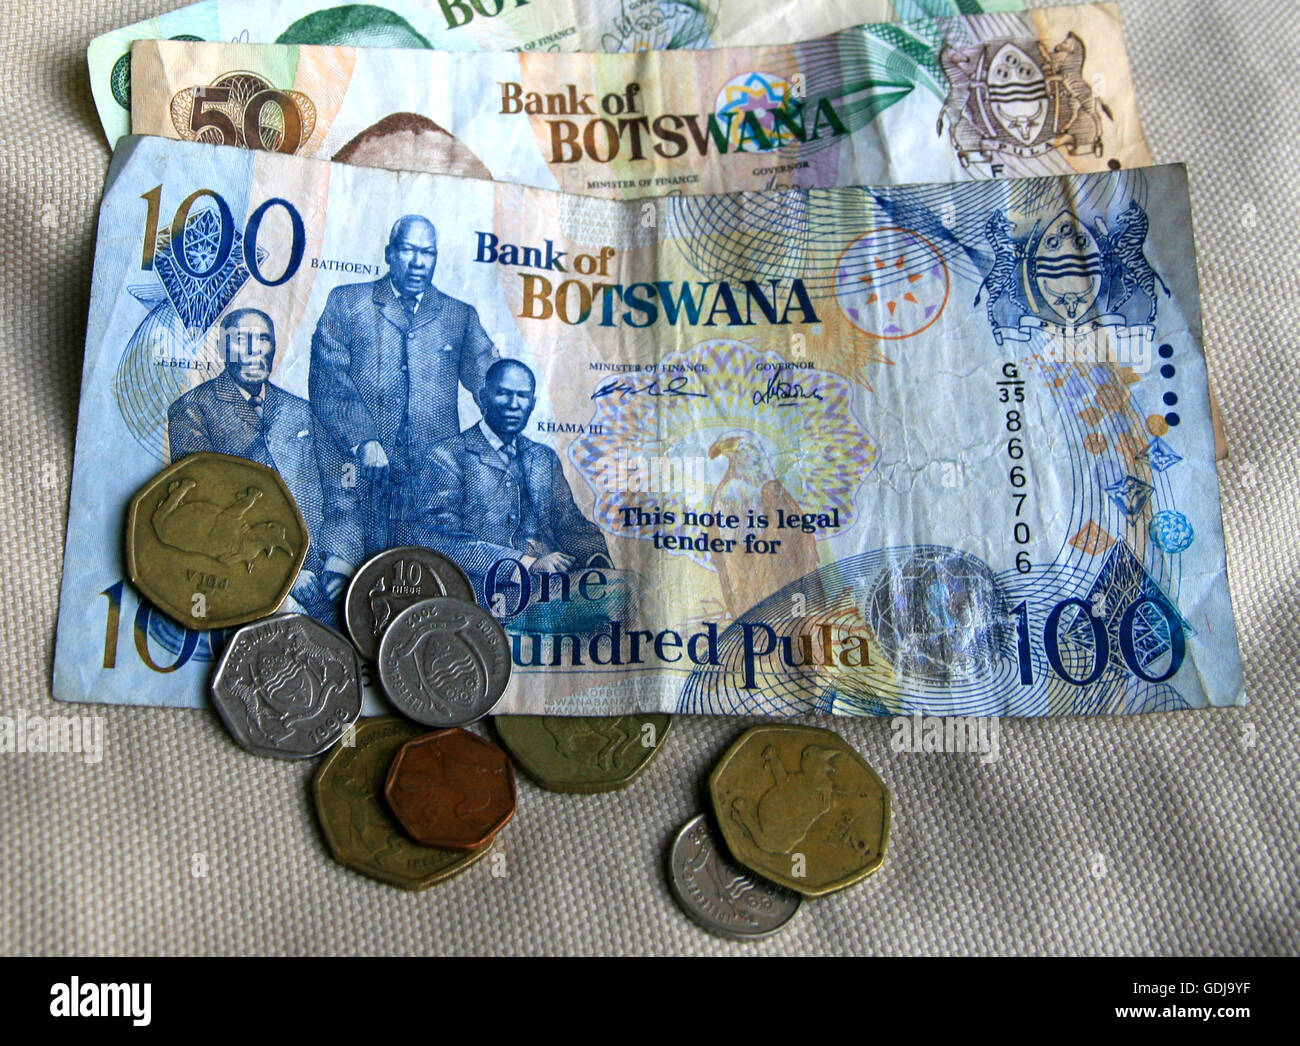 Pula Botswana Currency Stock Photo 111655699 Alamy